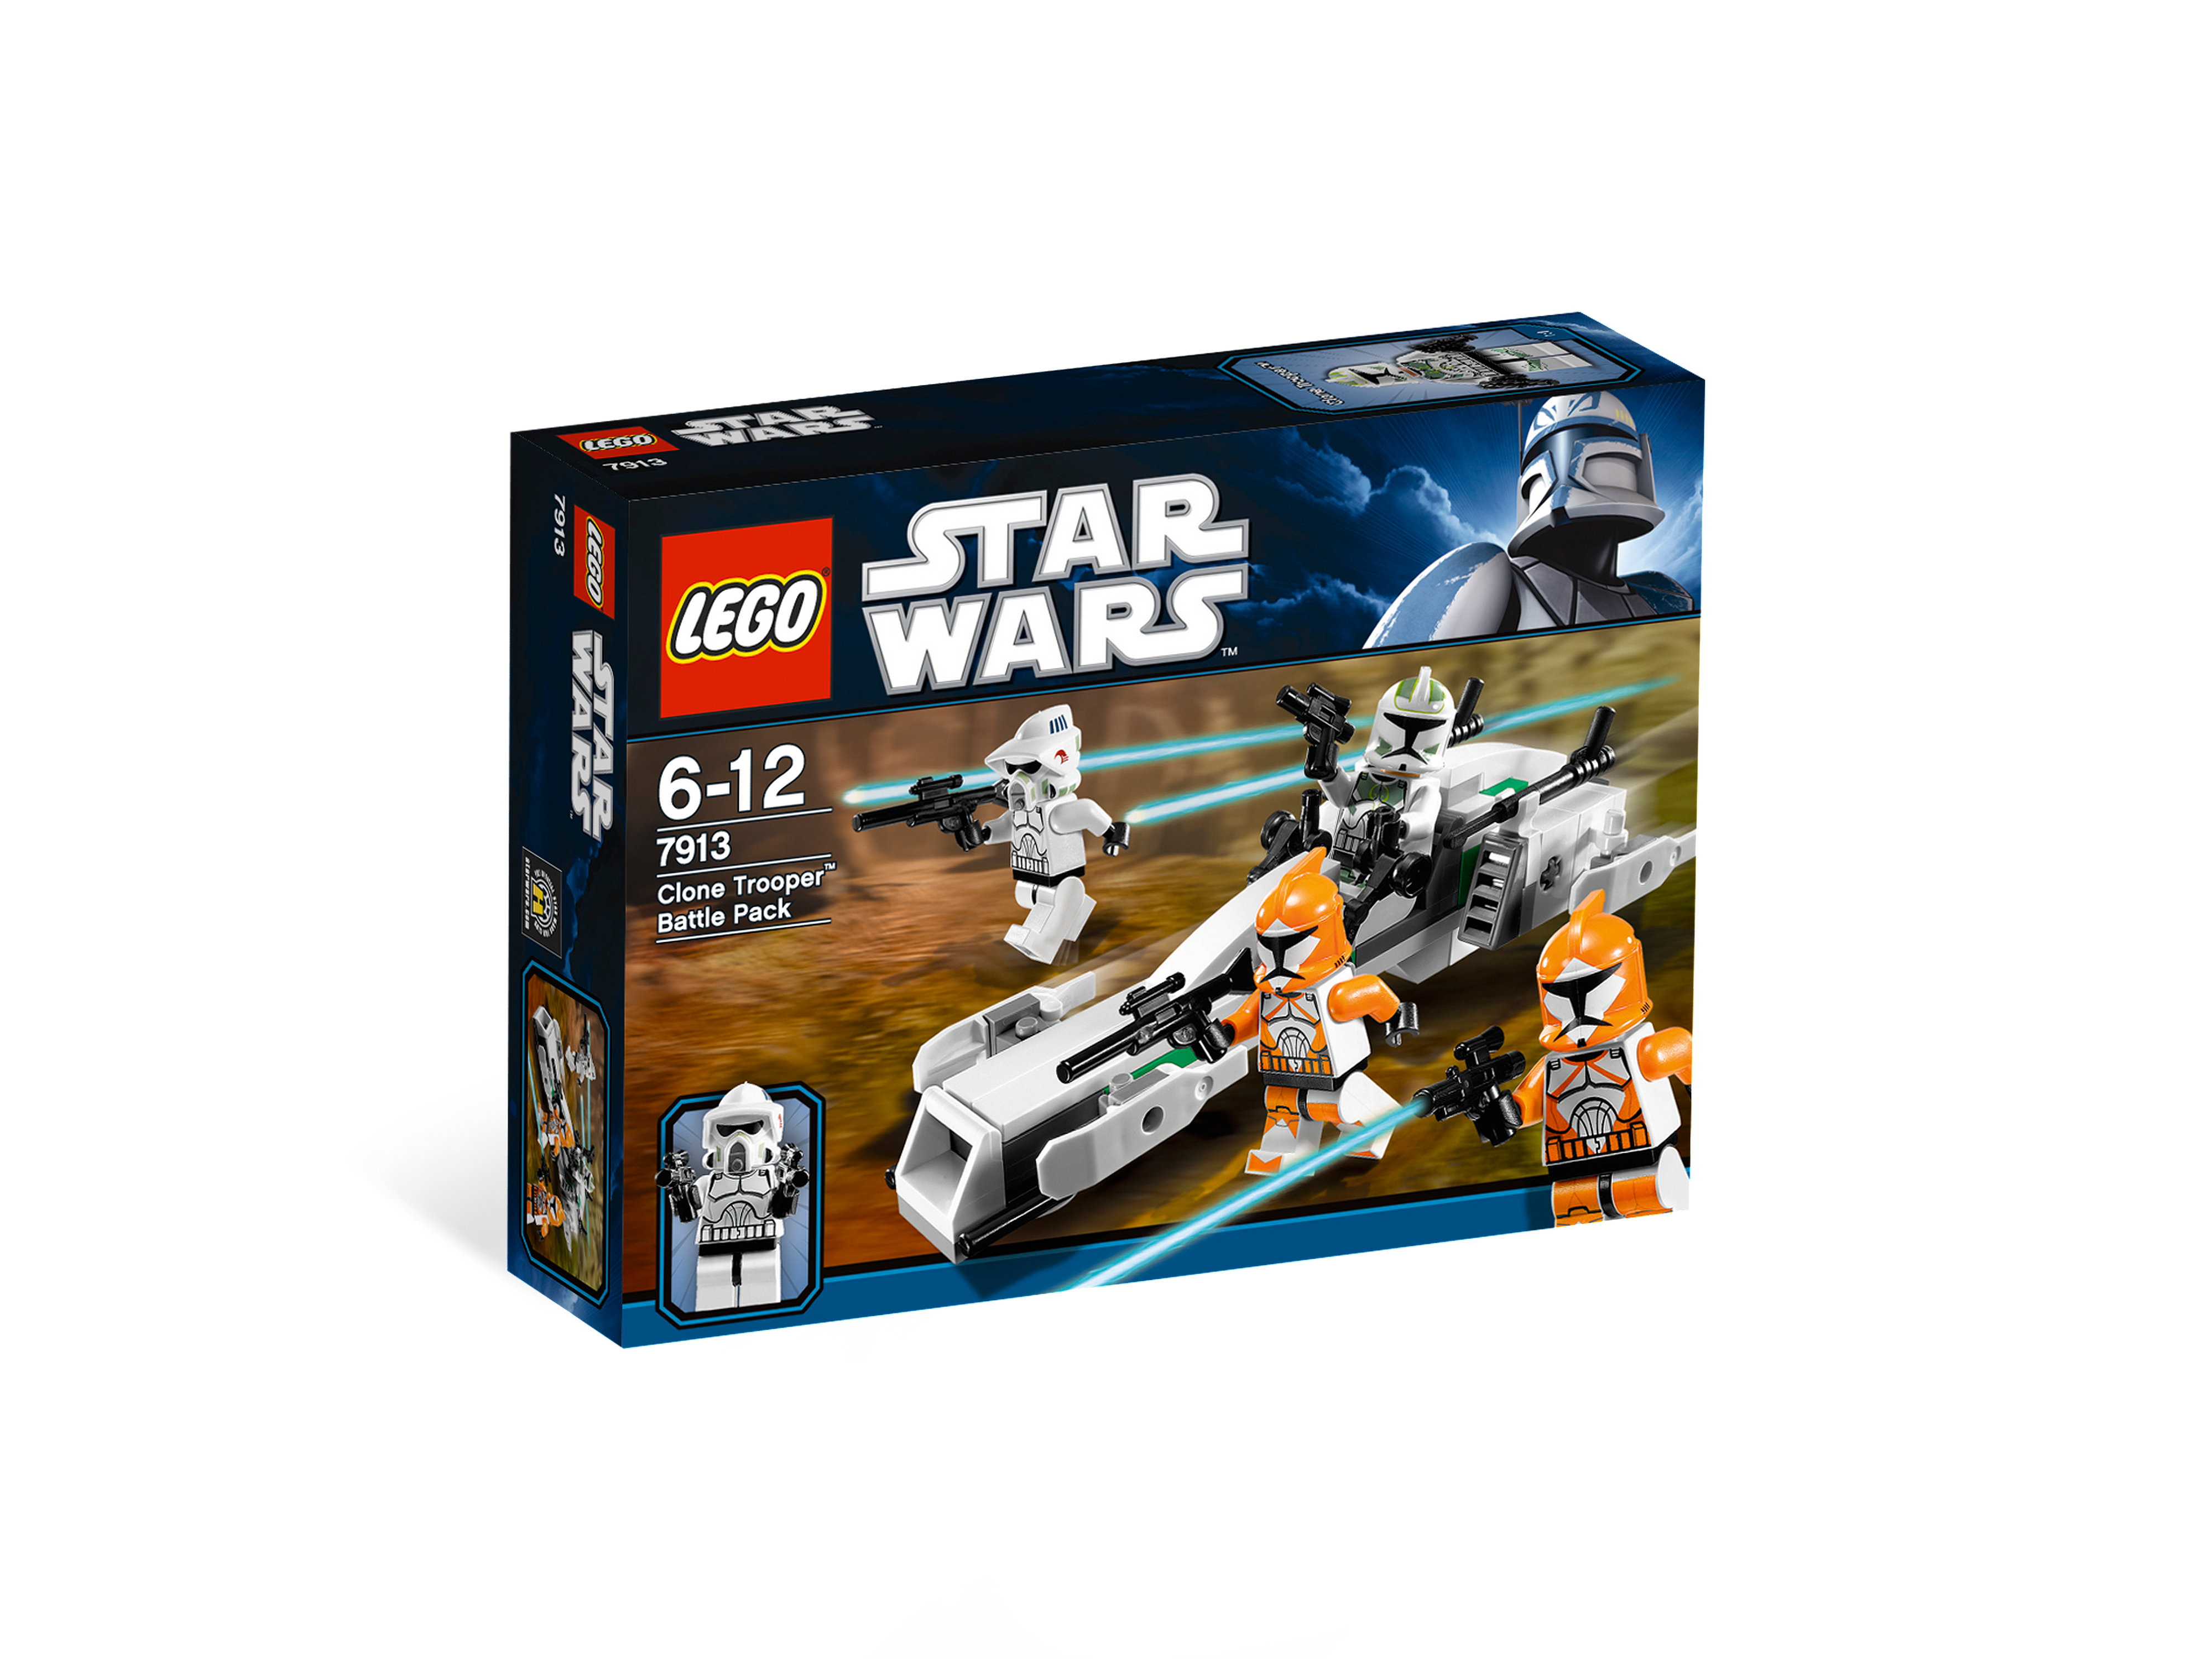 7913 Clone Trooper Battle Pack Brickipedia Fandom Powered By Wikia